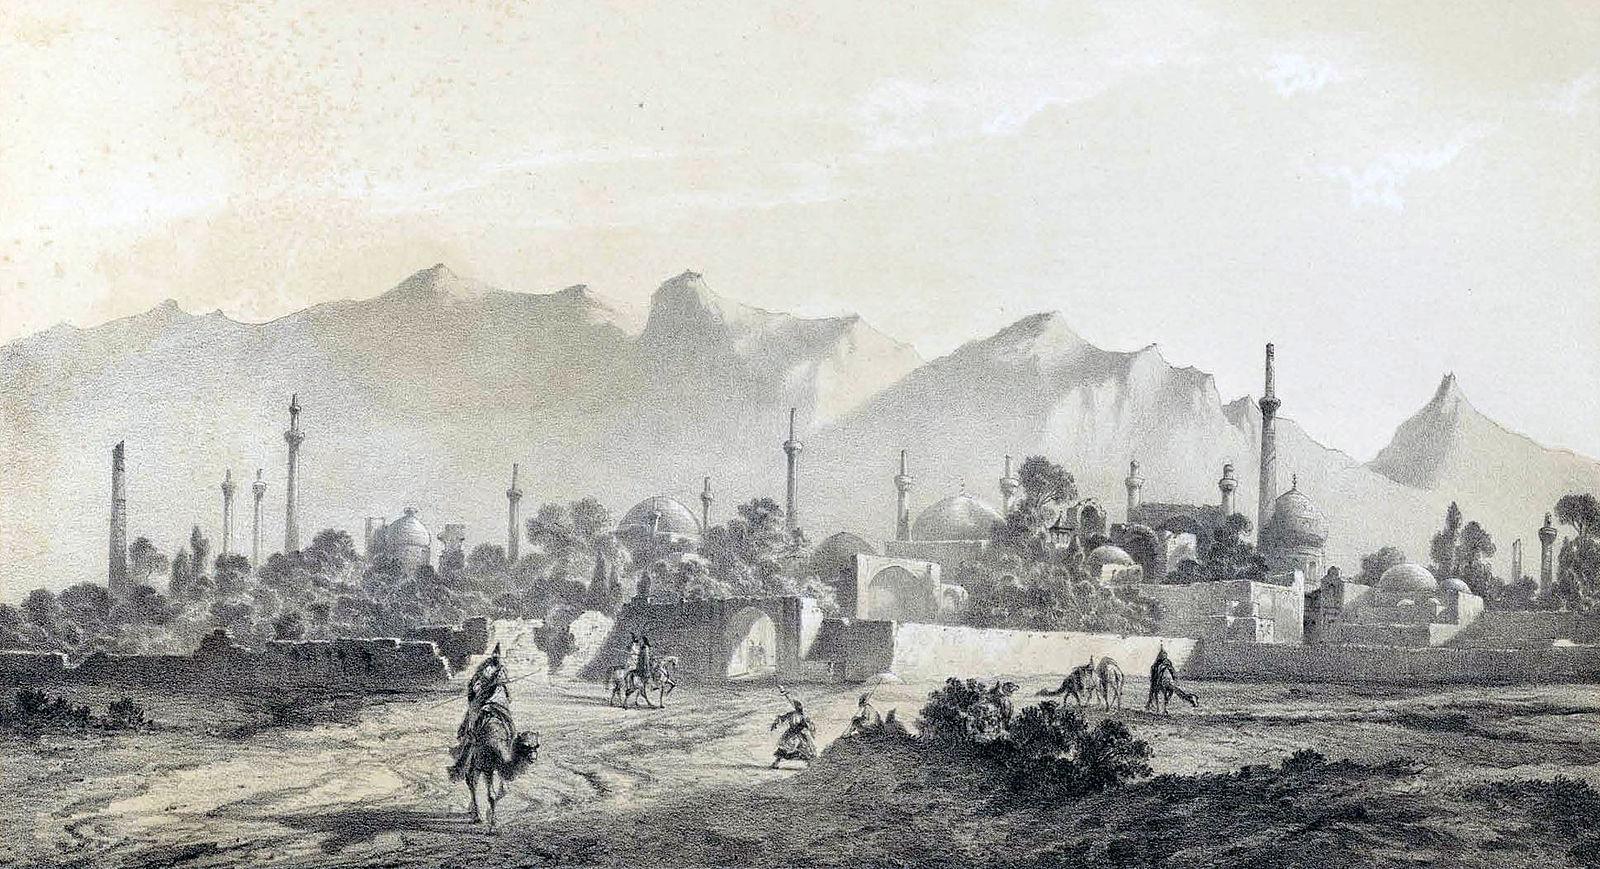 De la Perse sunnite et ses savants